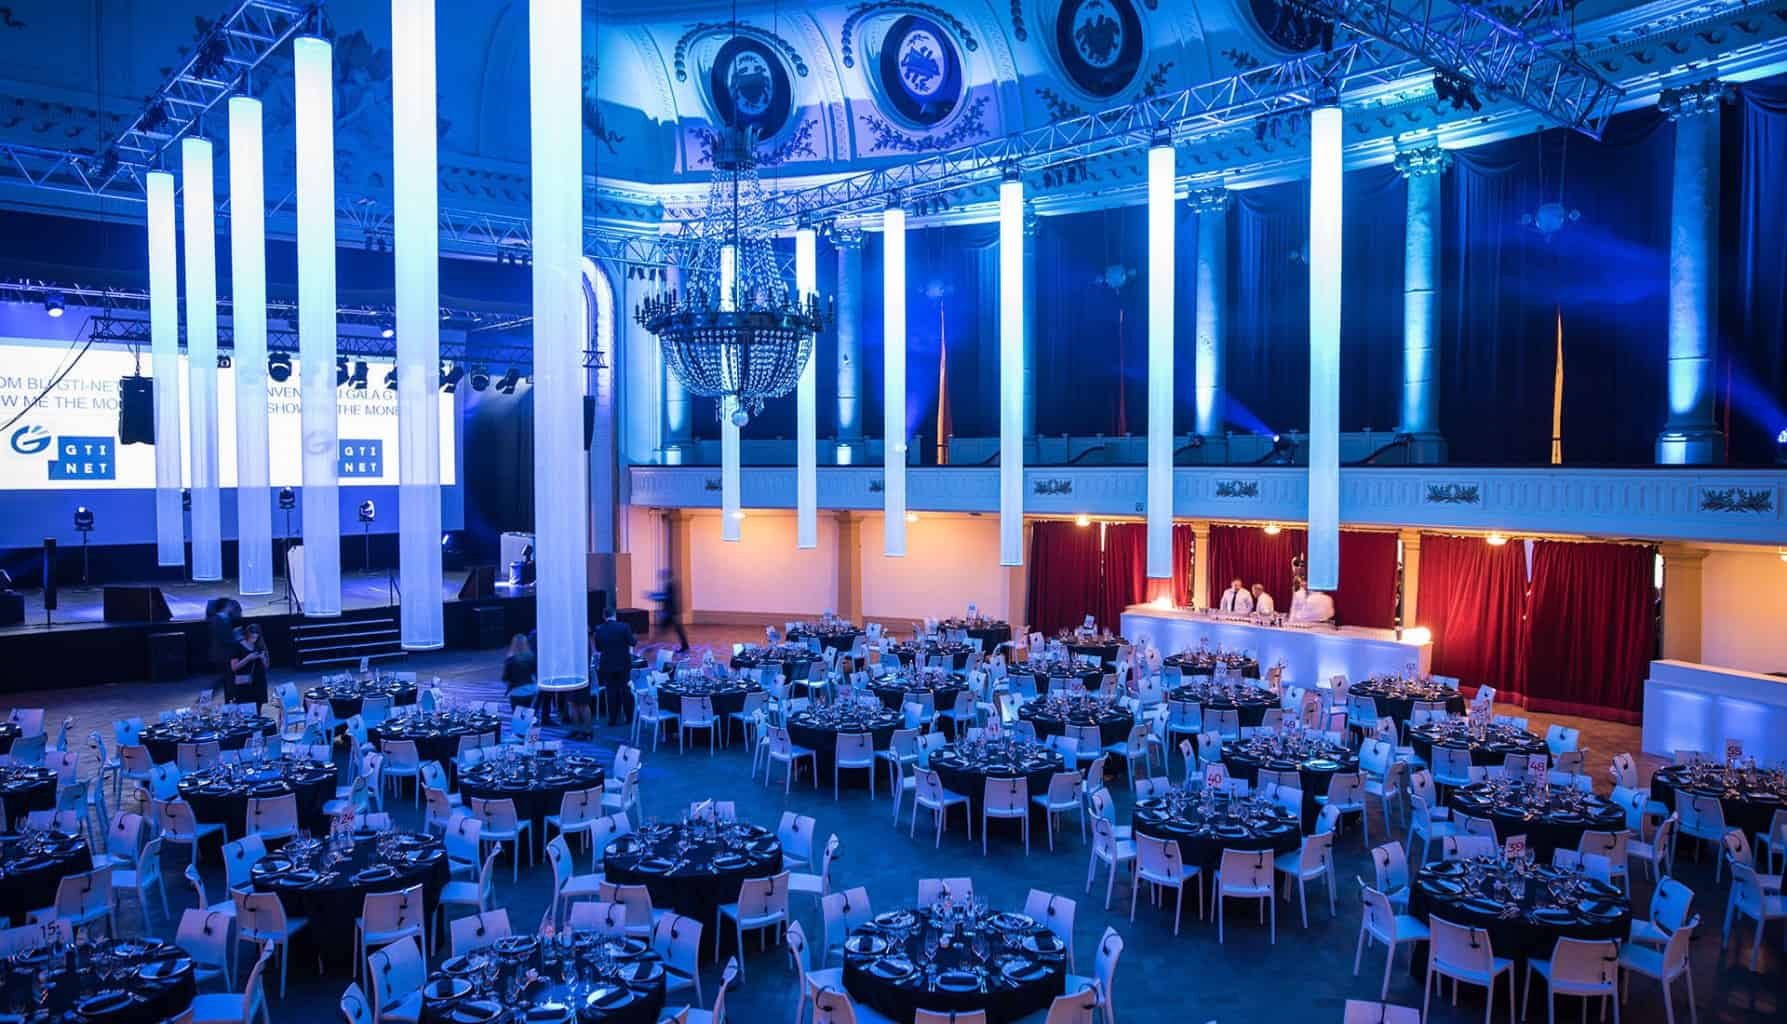 Soirée de Gala corporate organisé par So Event au casino de Spa